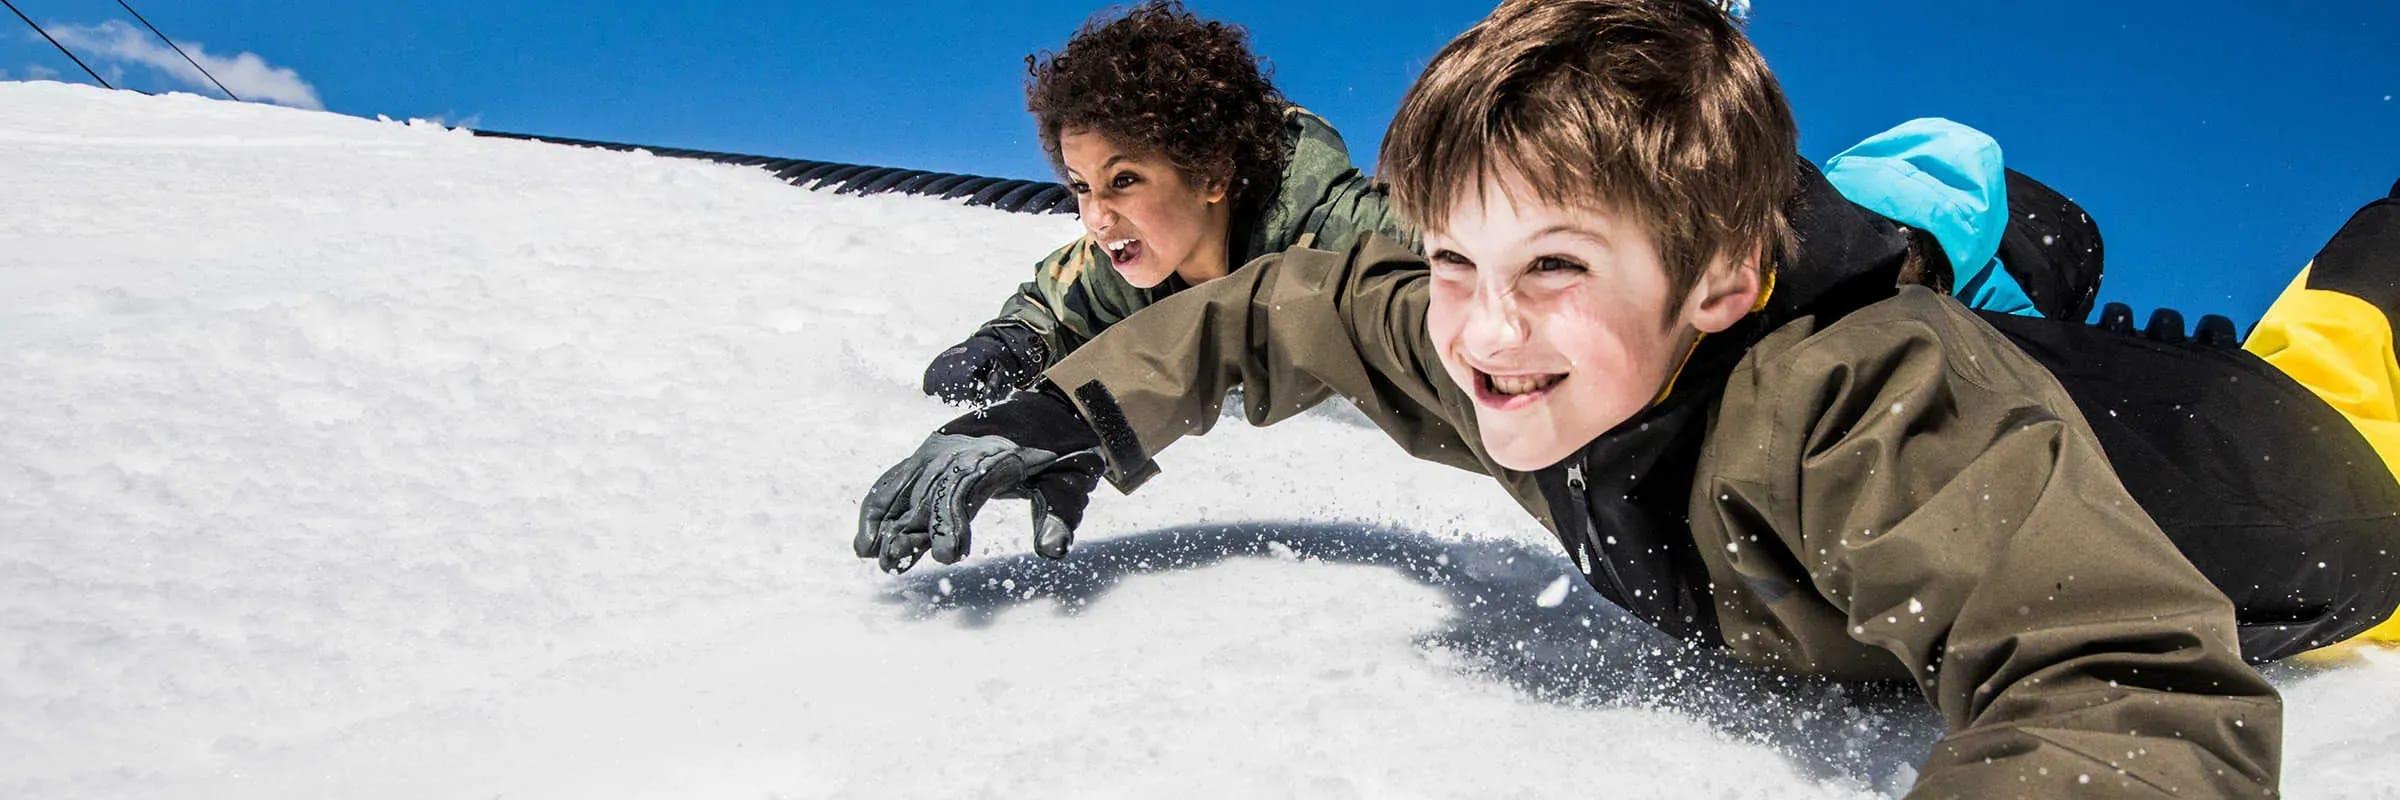 10 Best Kid's Winter Jackets